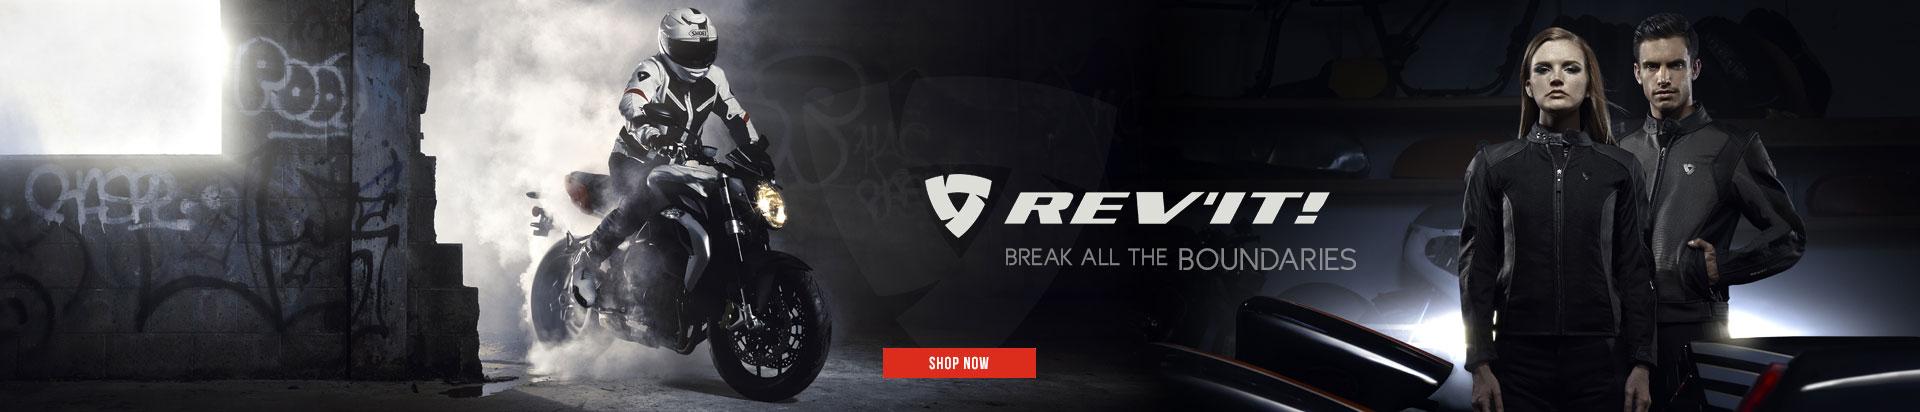 Rev It Clothing Range